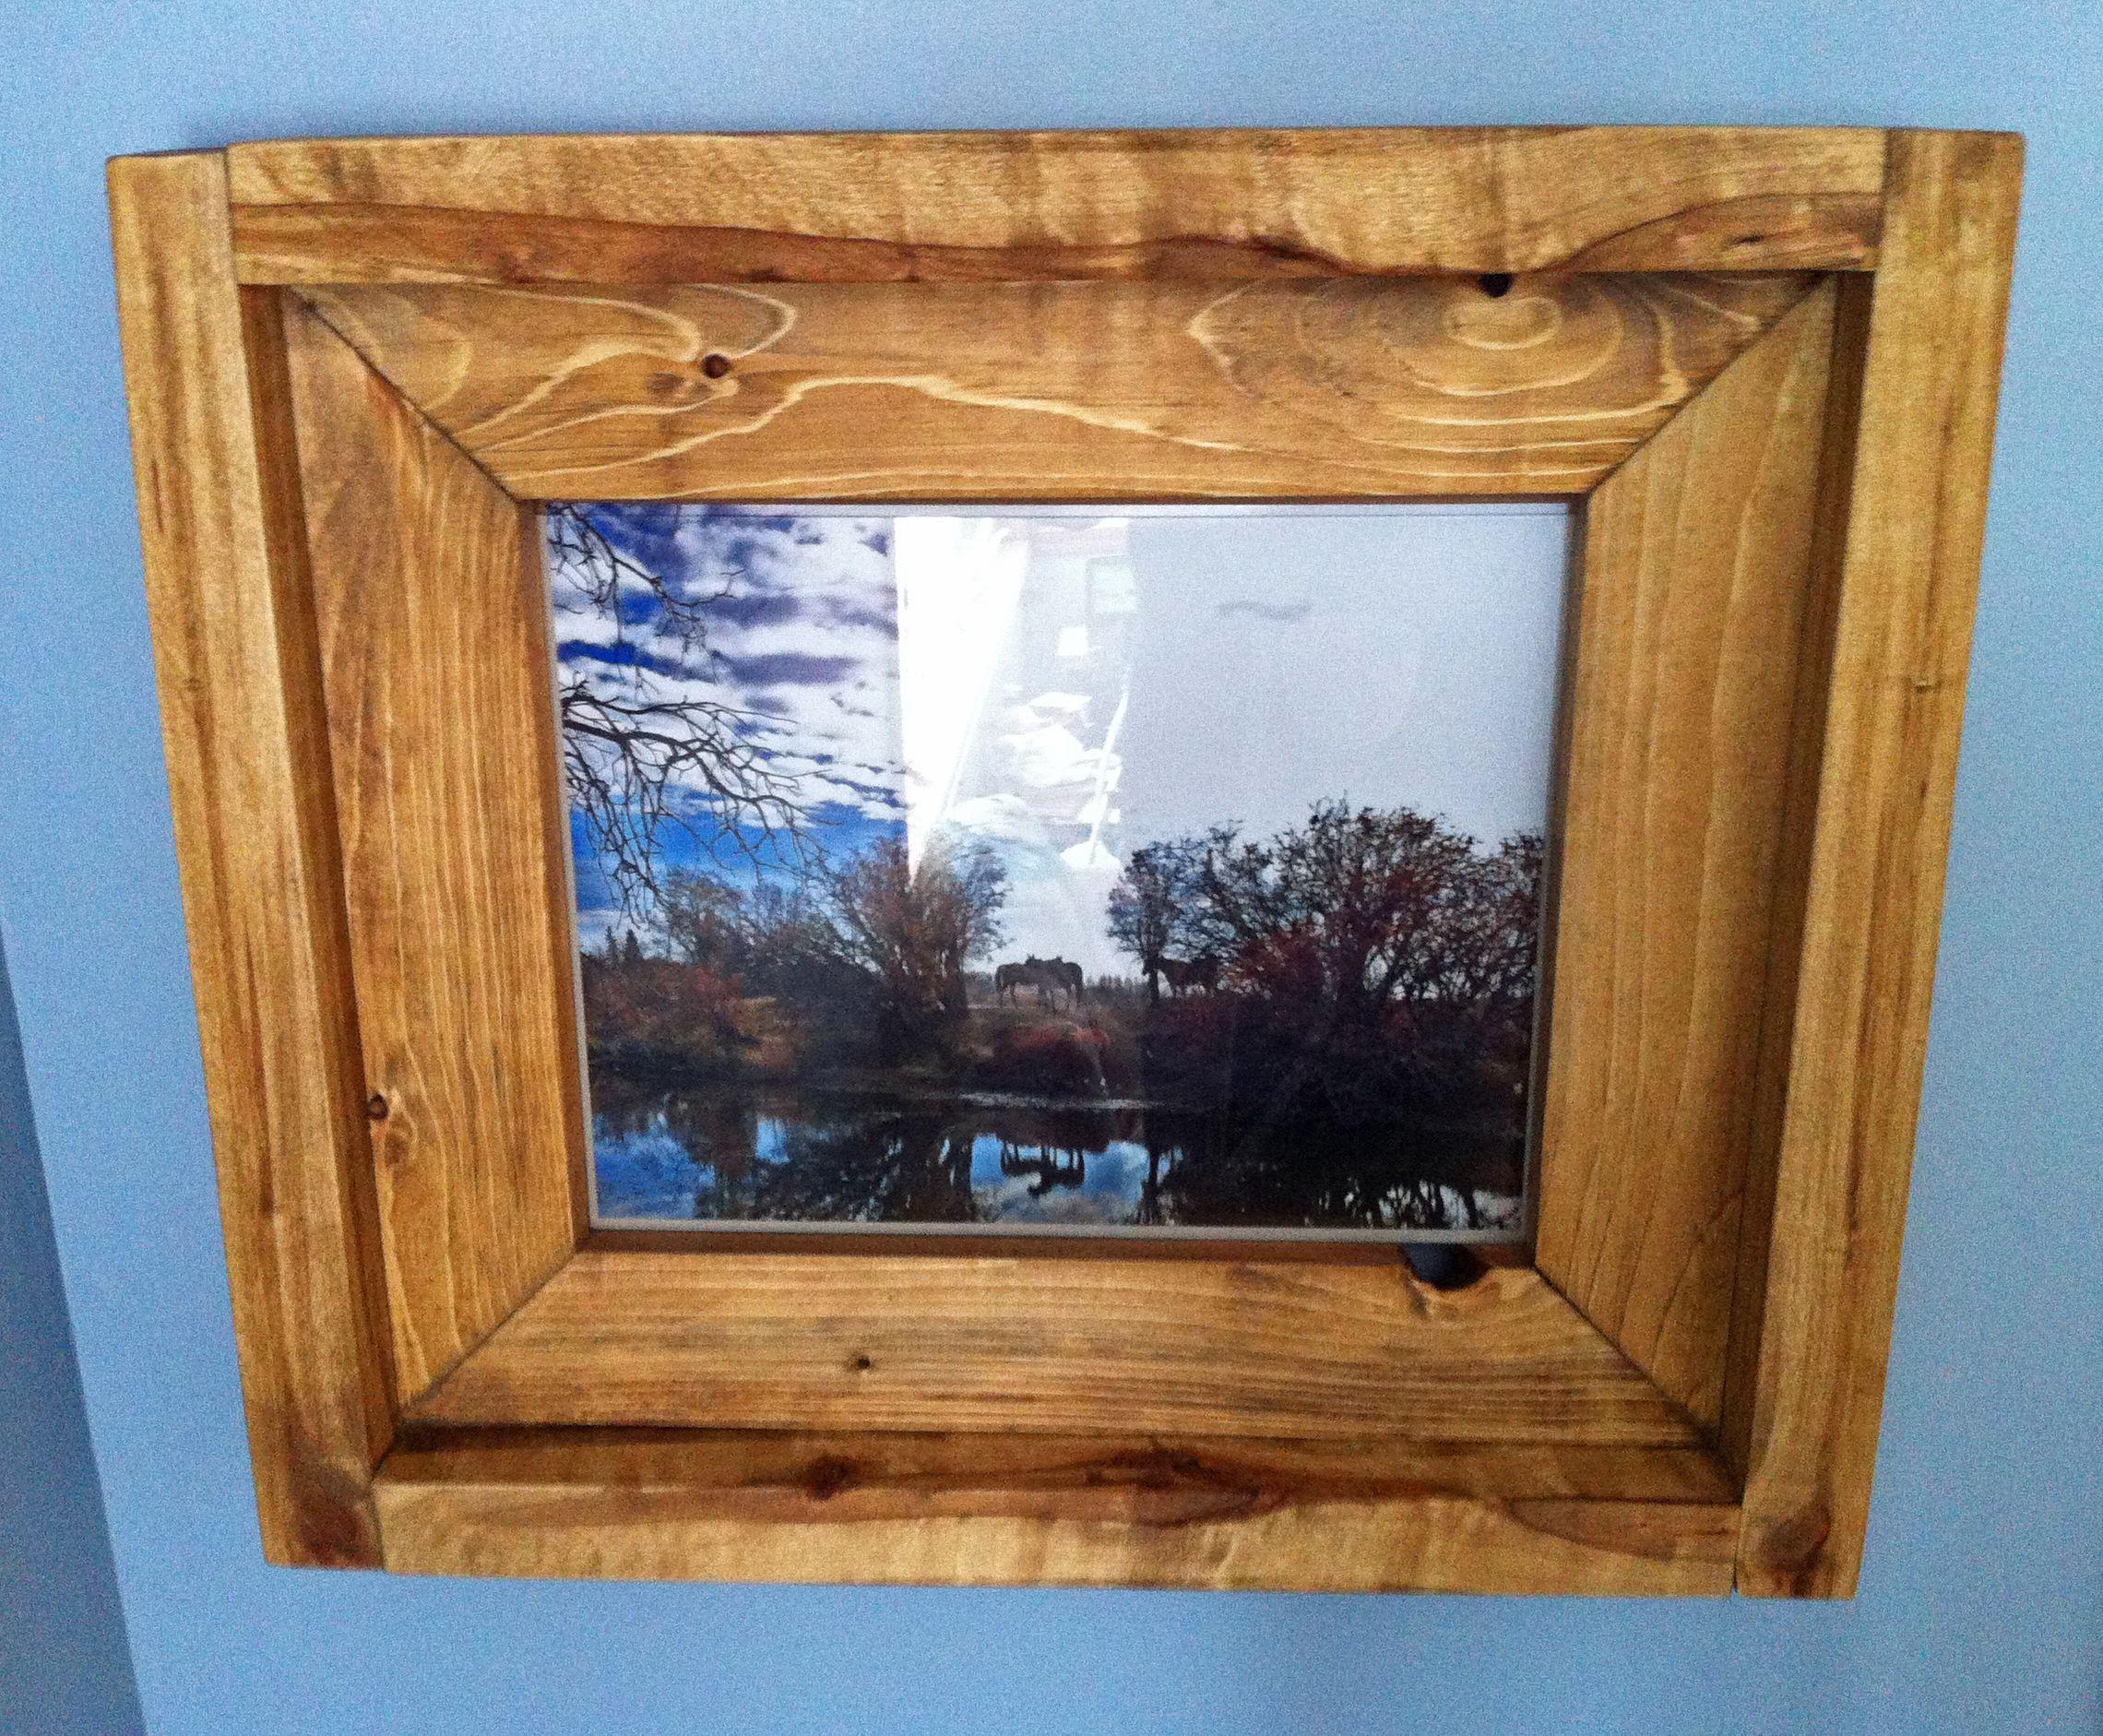 Wooden picture frame 11x14 rough sawn poplar barn wood planed wooden picture frame 11x14 rough sawn poplar barn wood planed jeuxipadfo Gallery